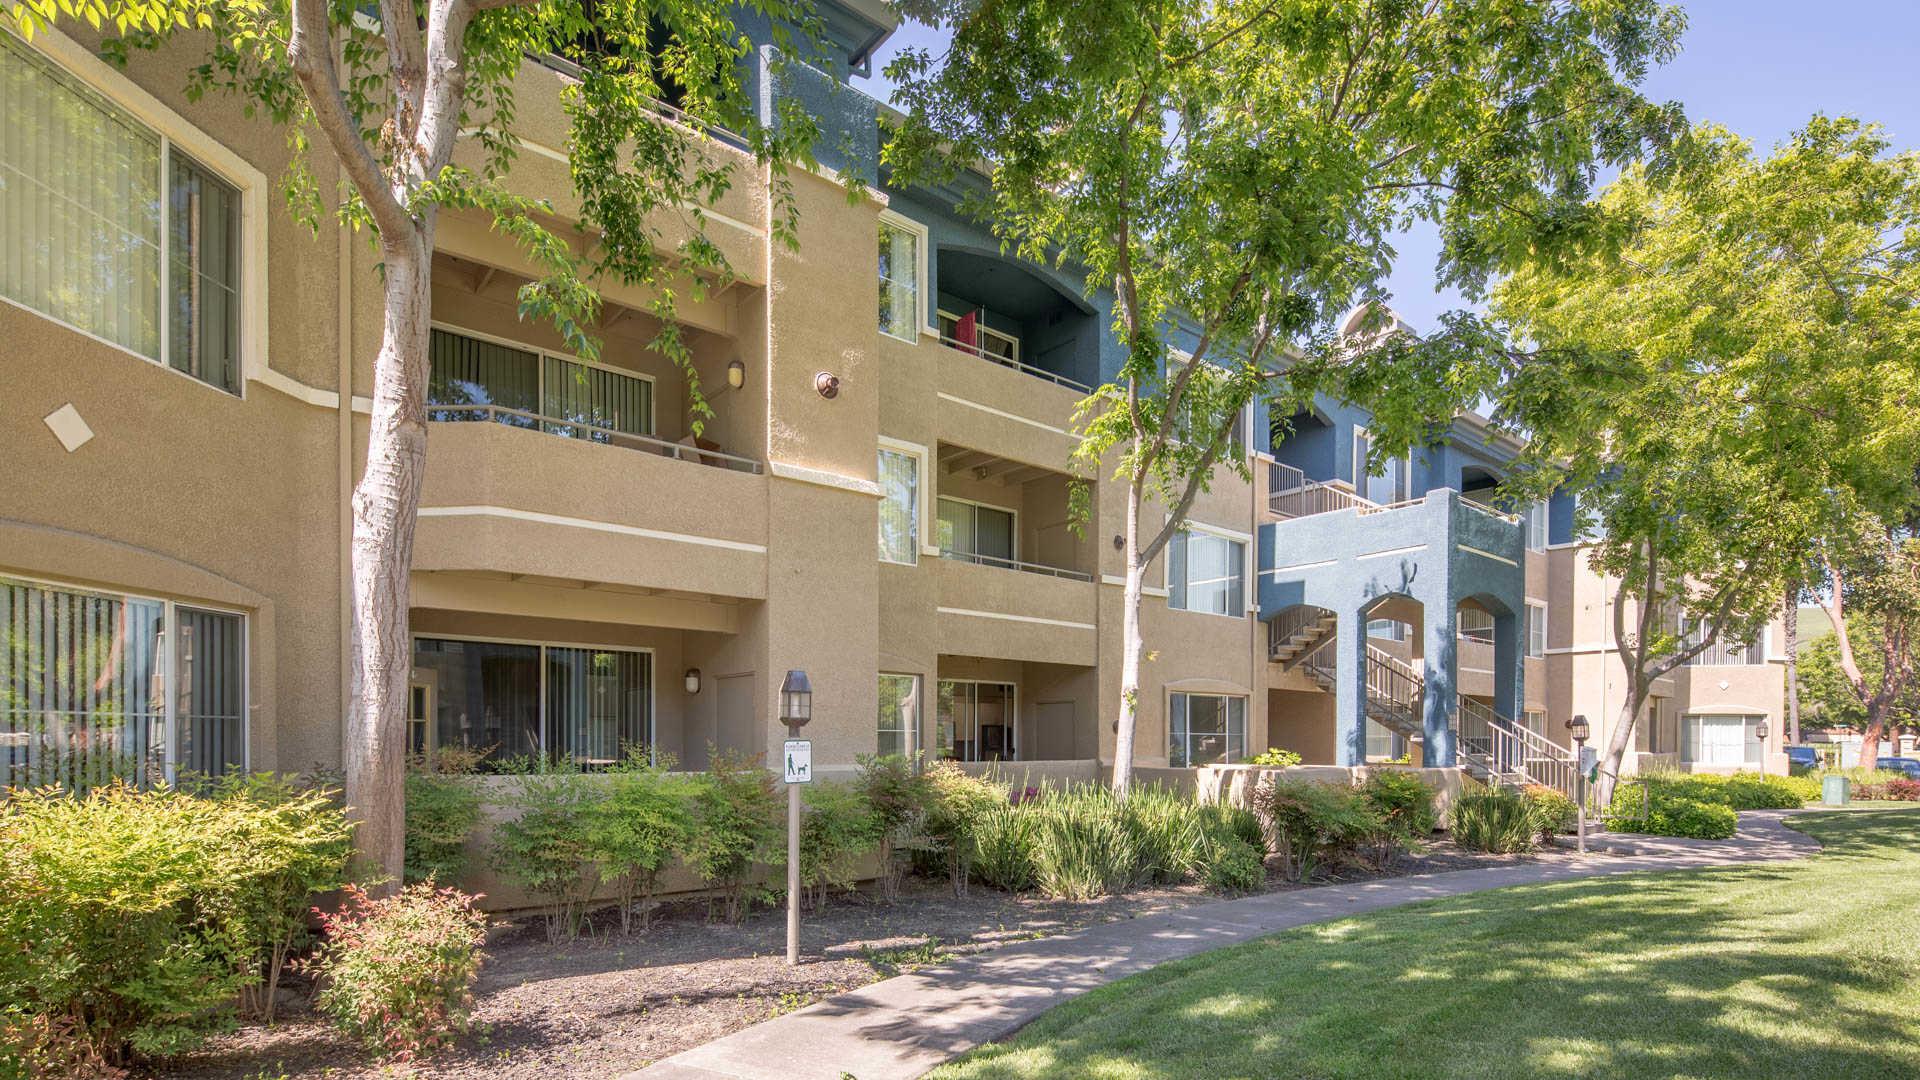 San Francisco Apartments For Rent Craigslist | baby-starlight